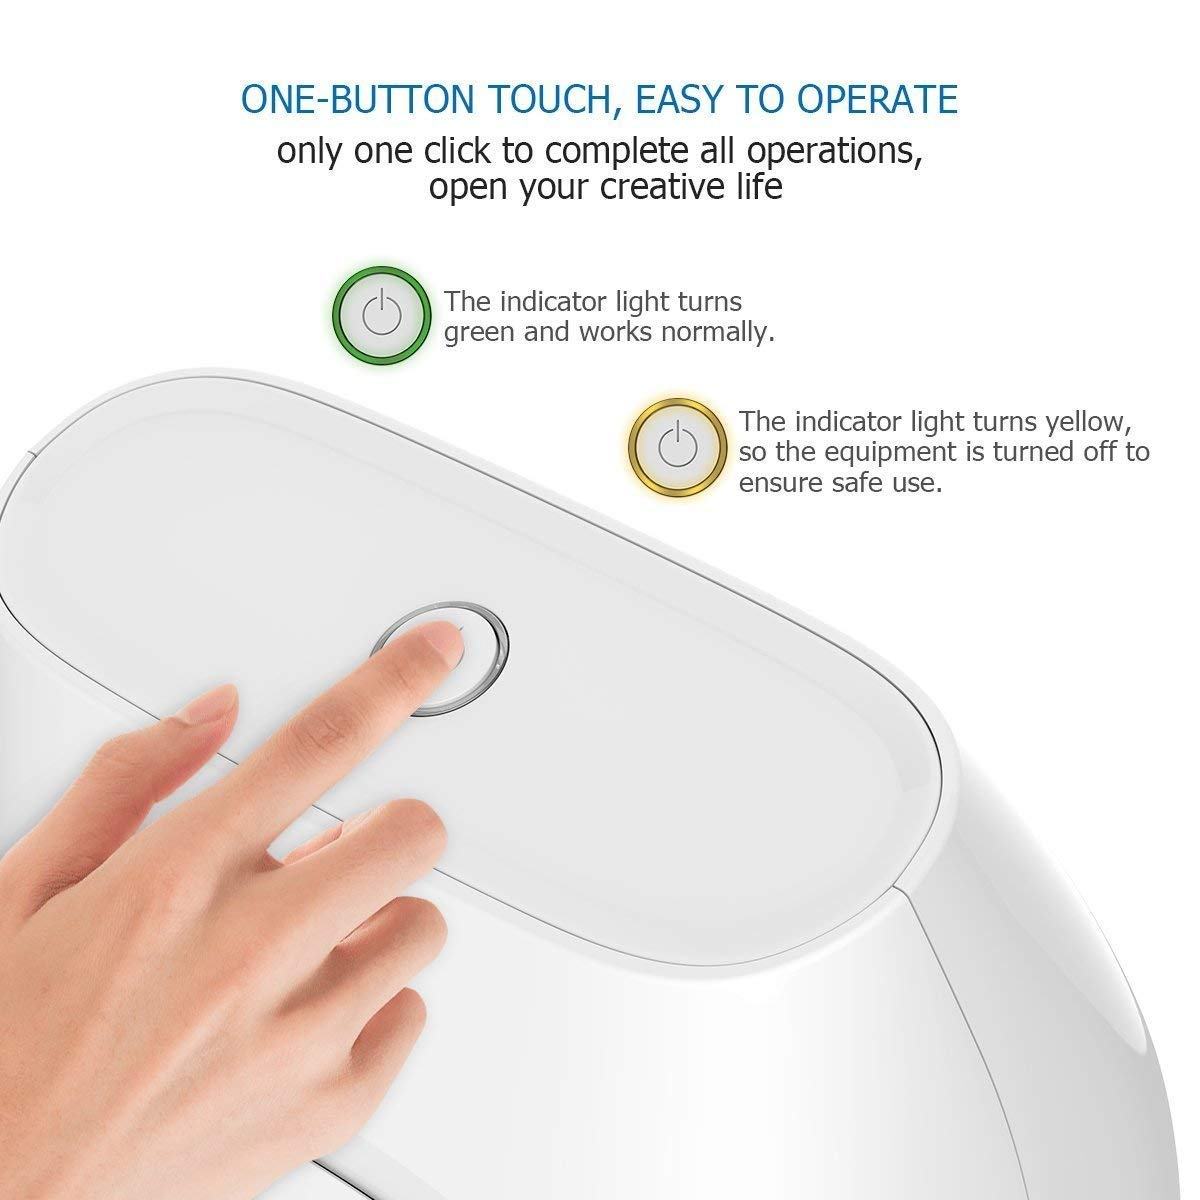 Bathroom Homemaxs Dehumidifier Closet Wardrobe Basements Office 700ml Portable Dehumidifier Super Quiet Air Electric Dehumidifiers Auto Shut Off Function in Bedroom